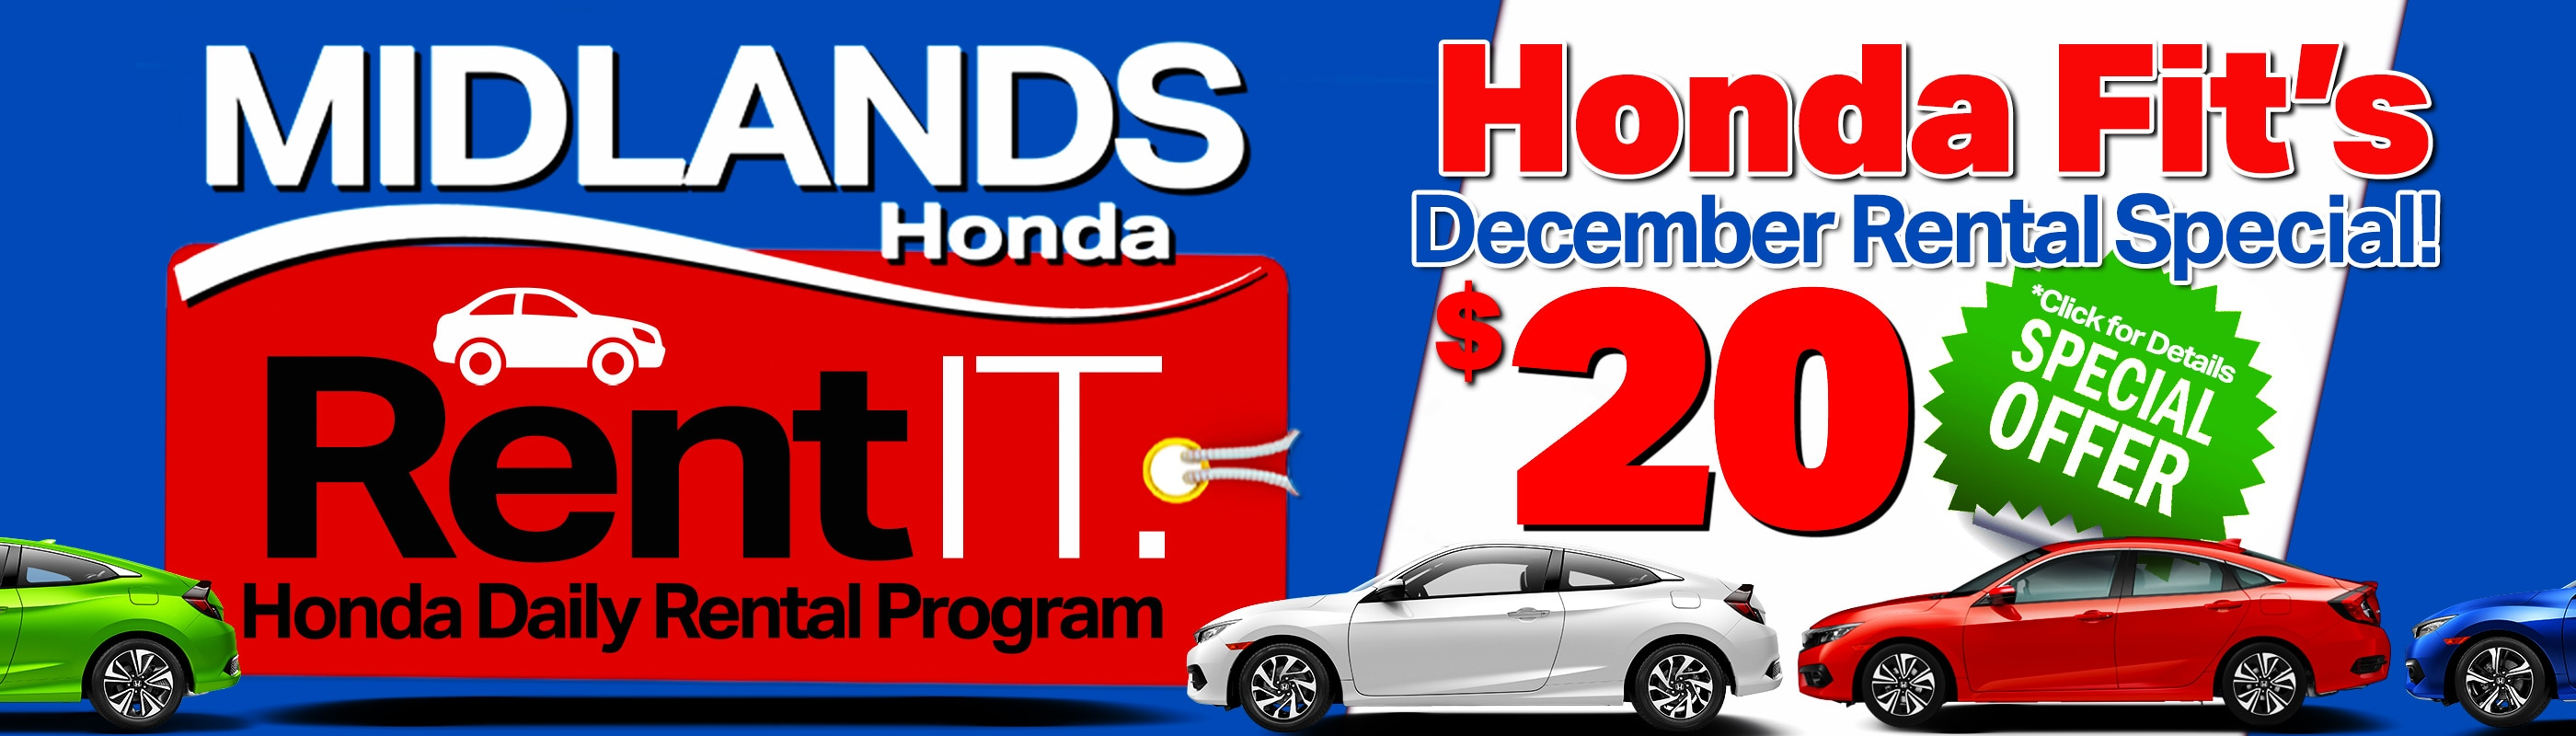 Honda Rental Cars